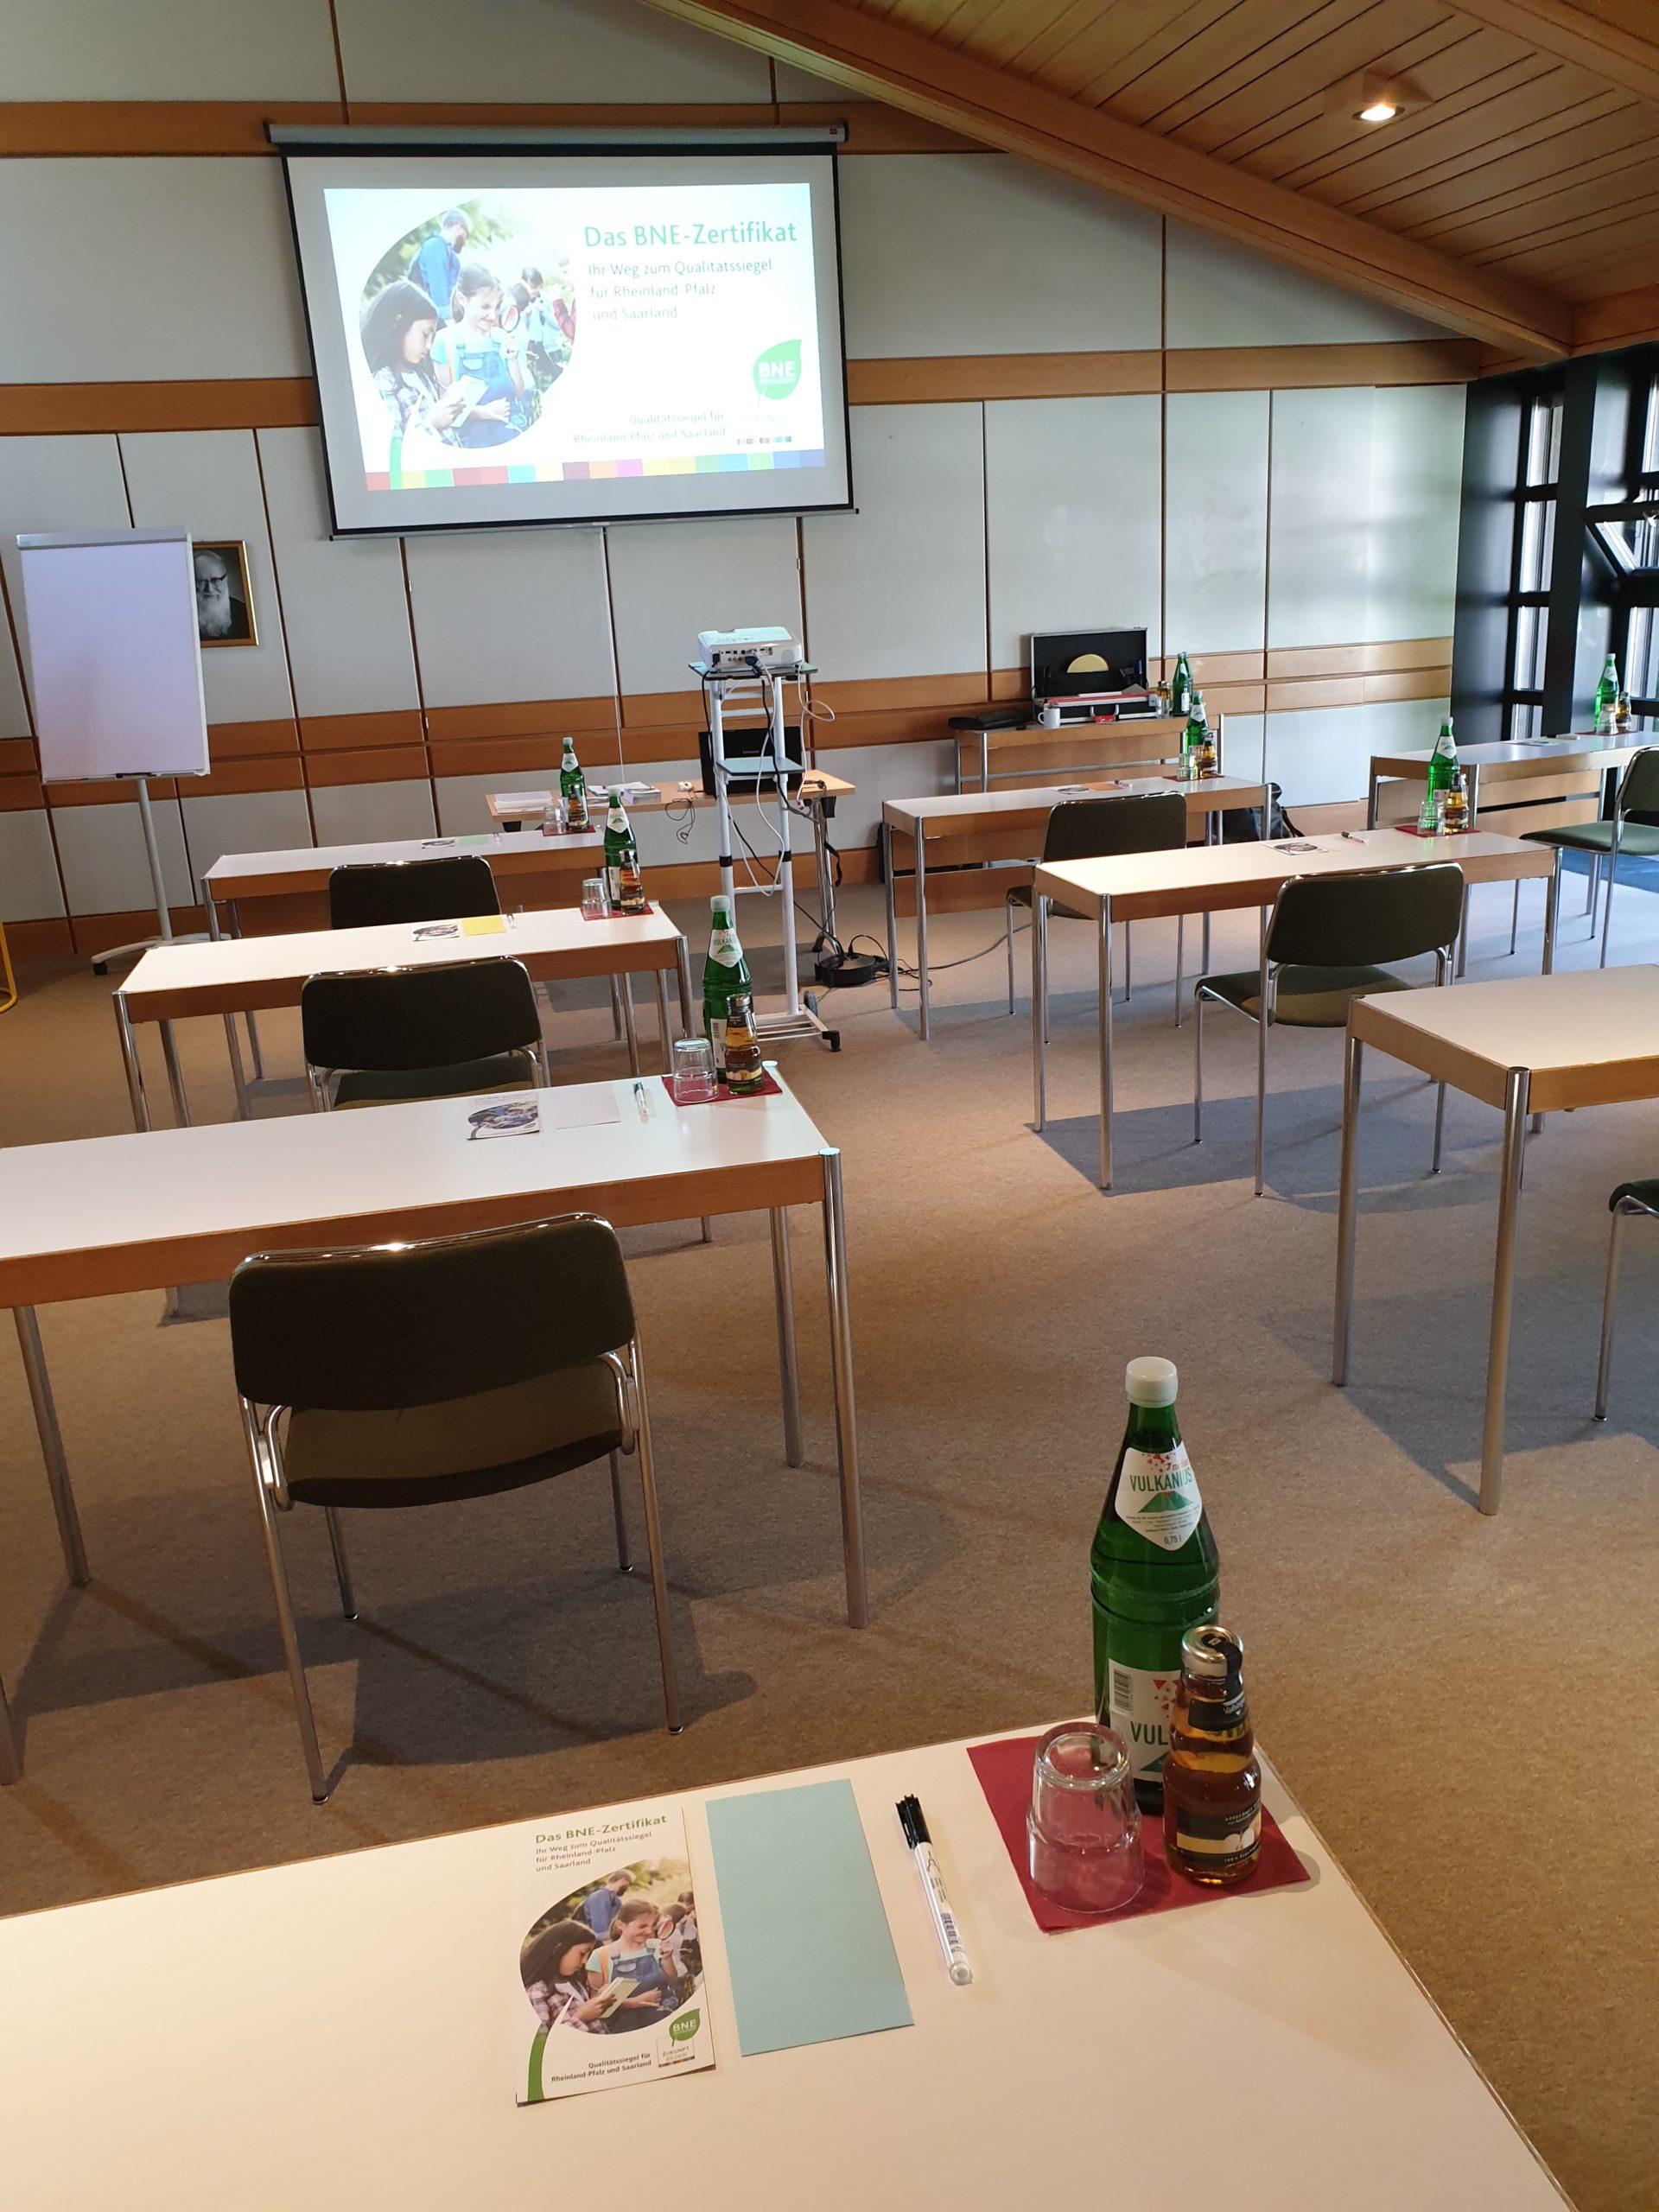 Seminarraum Bildungsstätte Marienland, Vallendar, August 2020